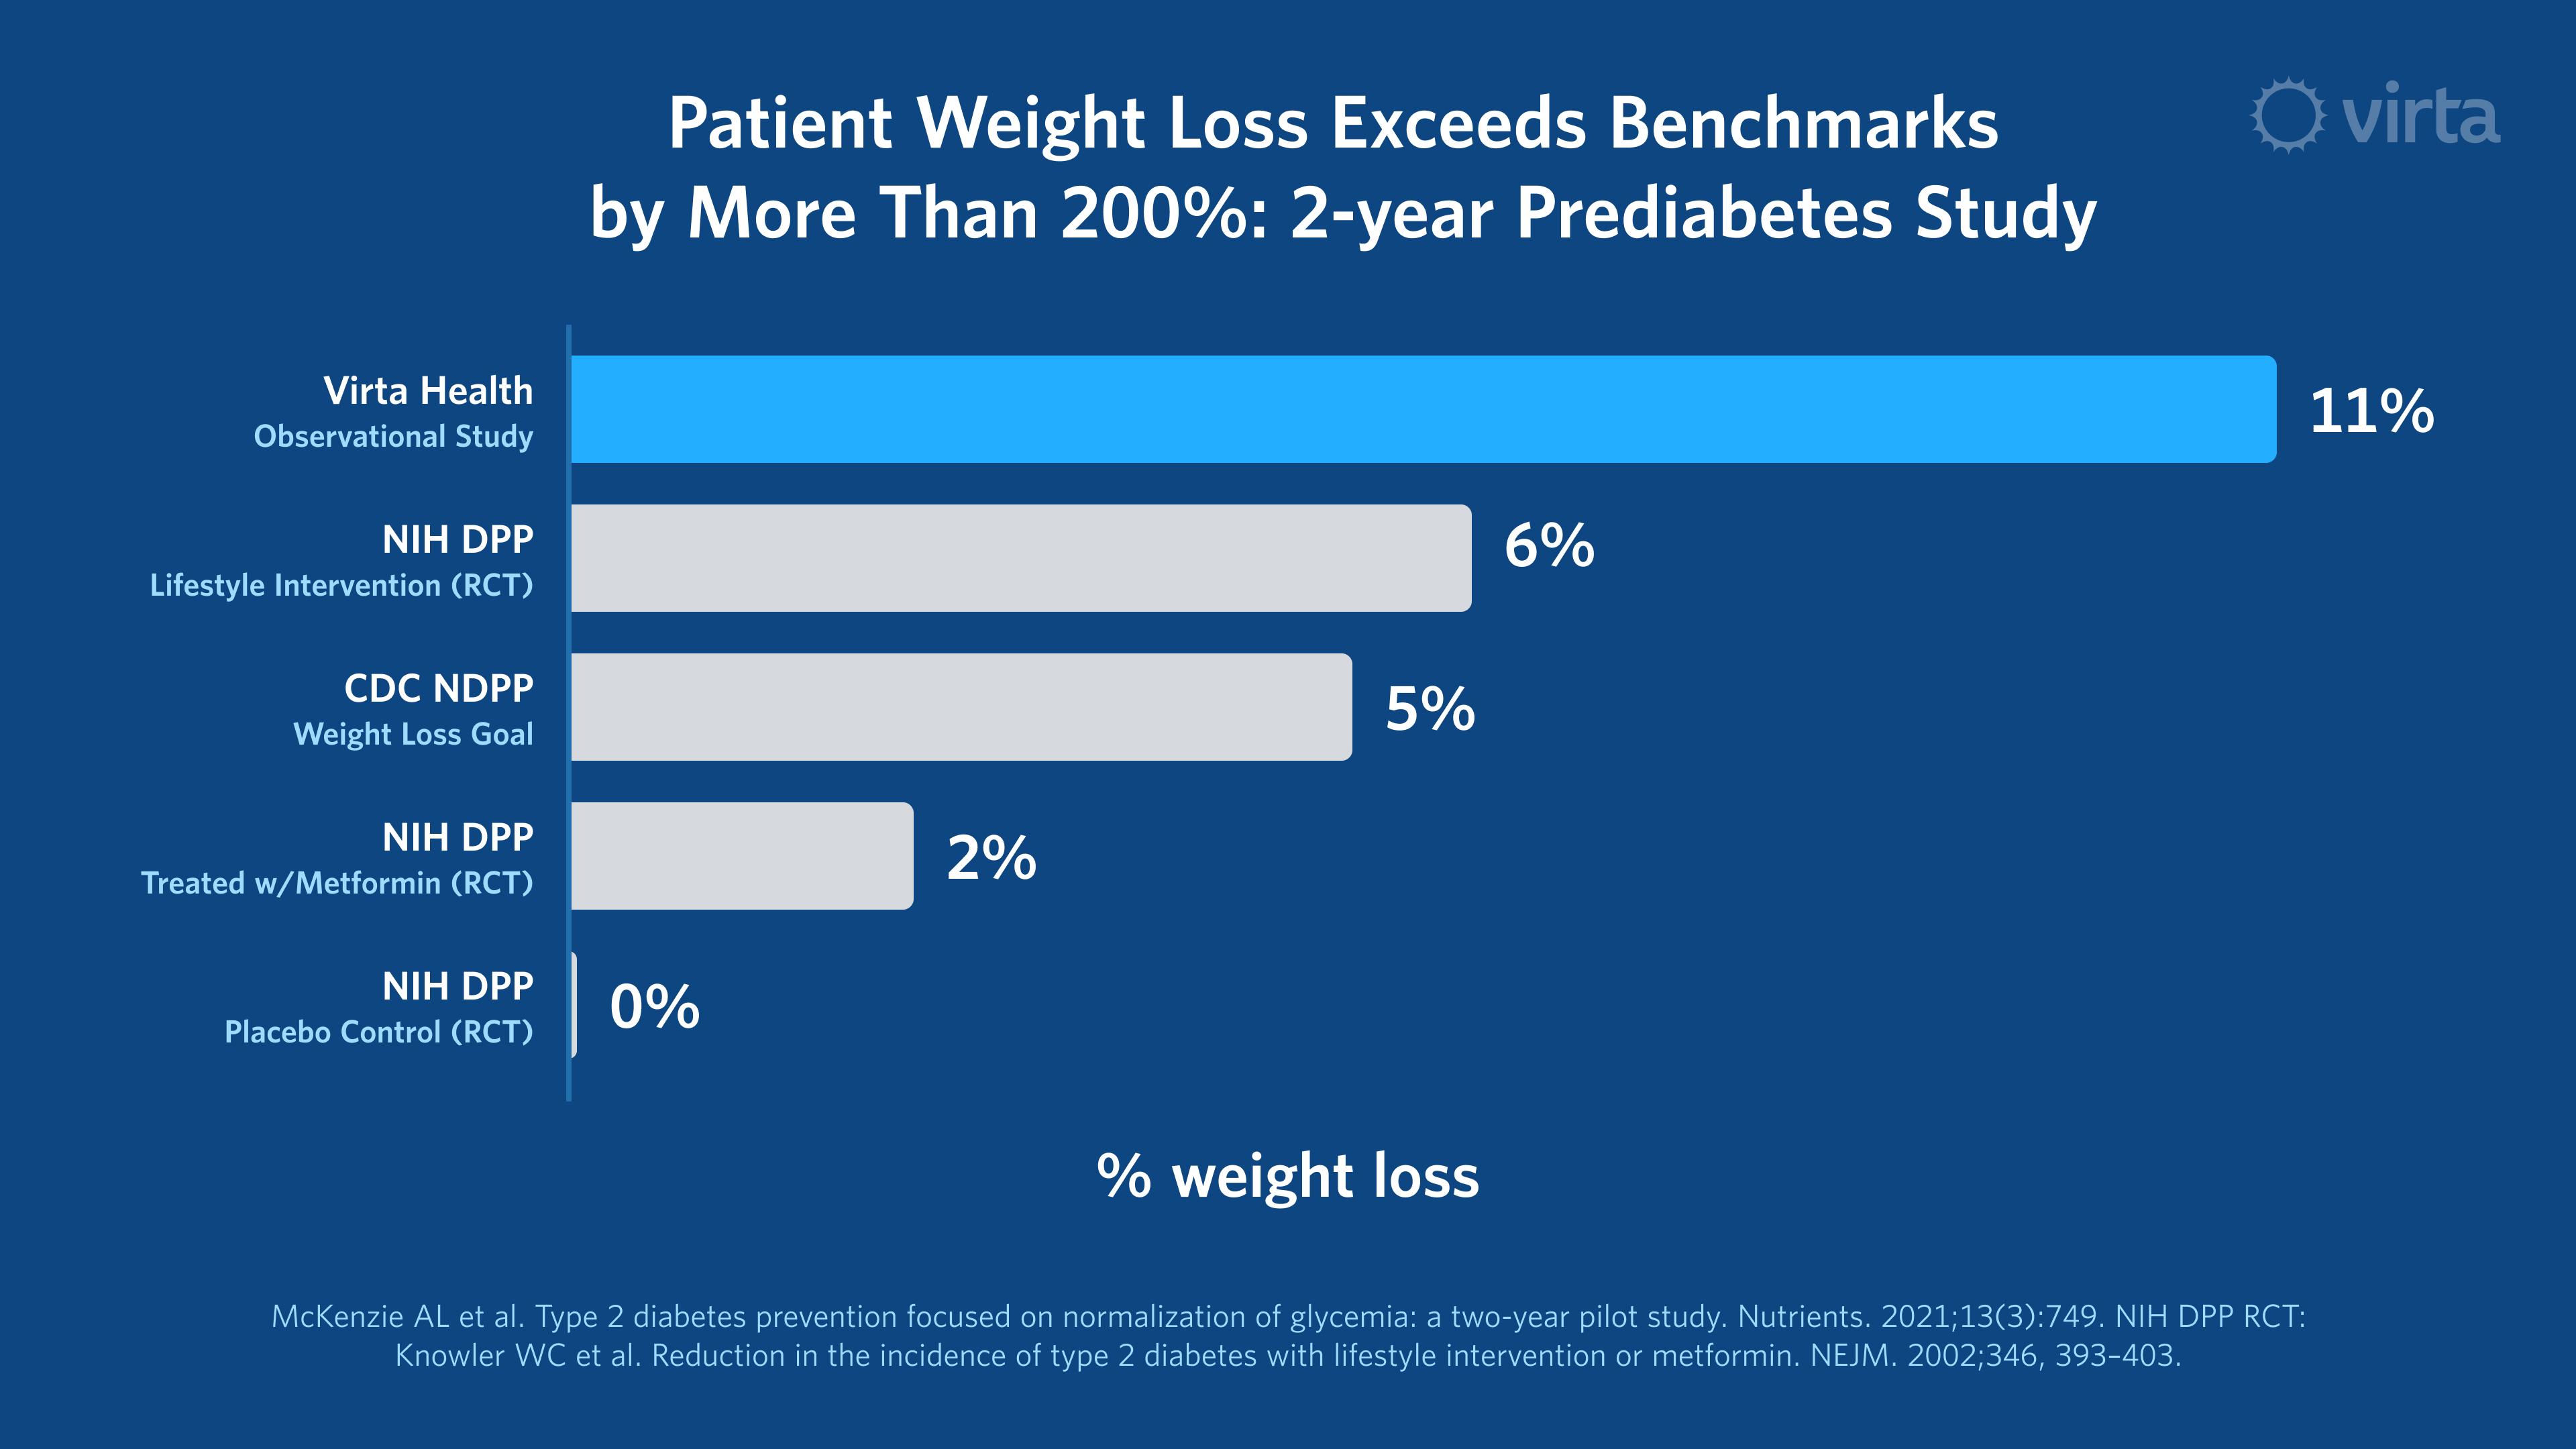 Virta Health Prediabetes Weight Loss